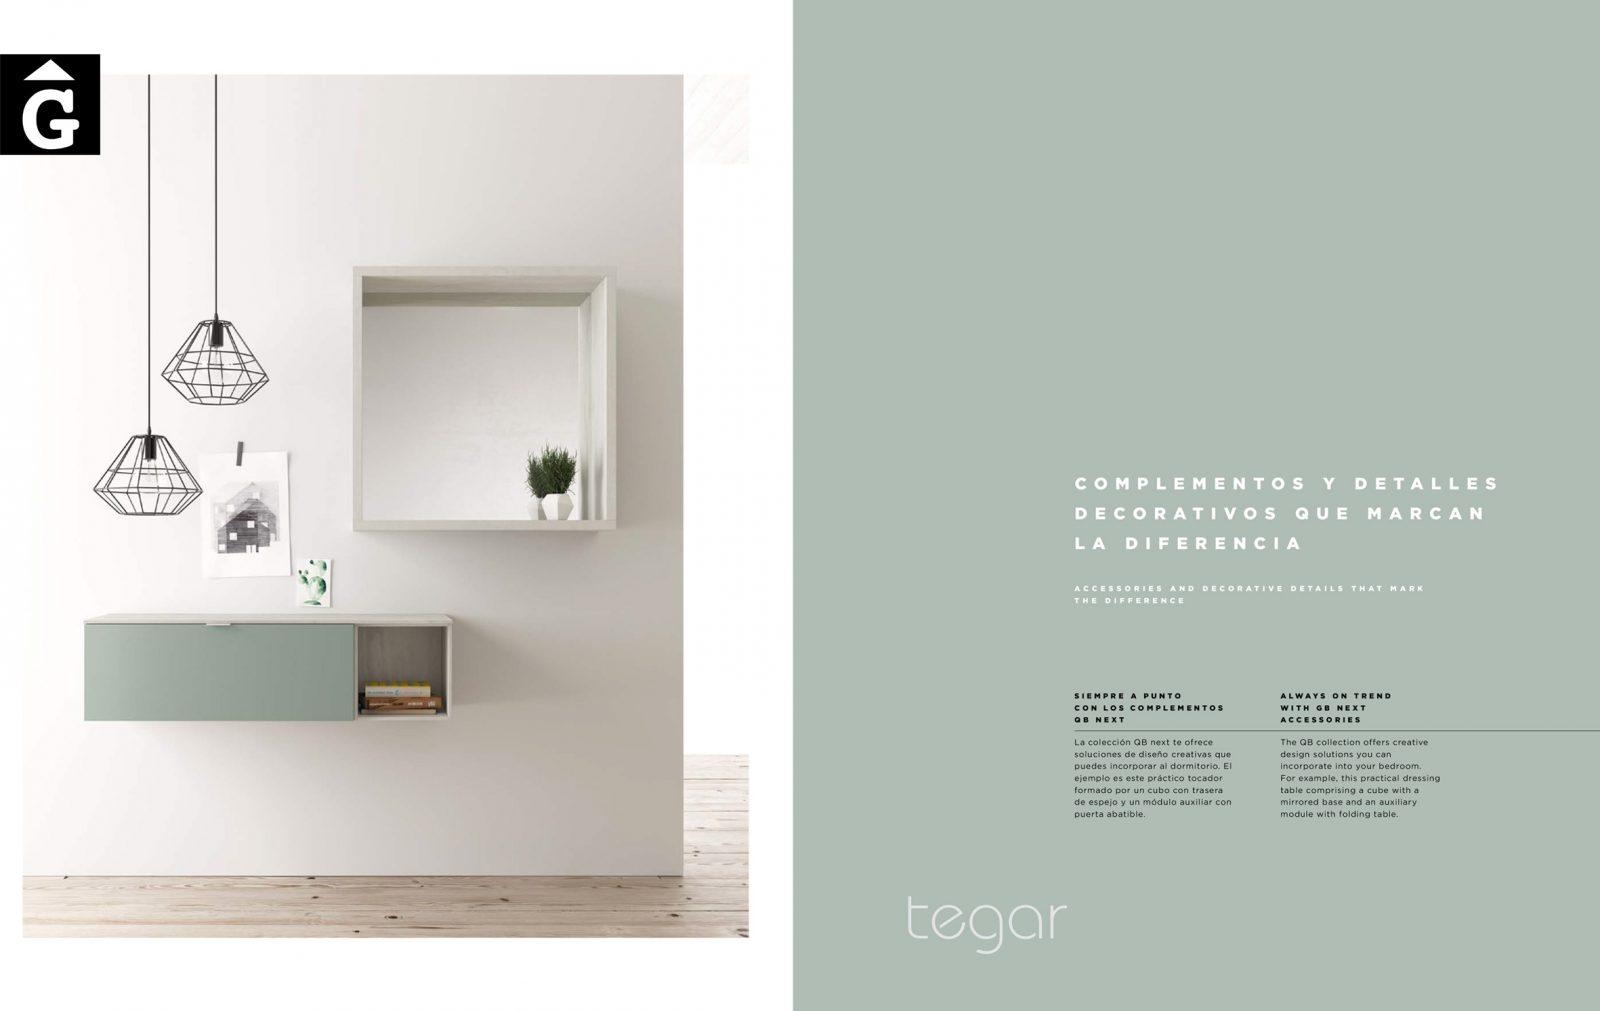 27 Complements QB NEXT Tegar by nobles GIFREU Girona modern minim elegant atemporal